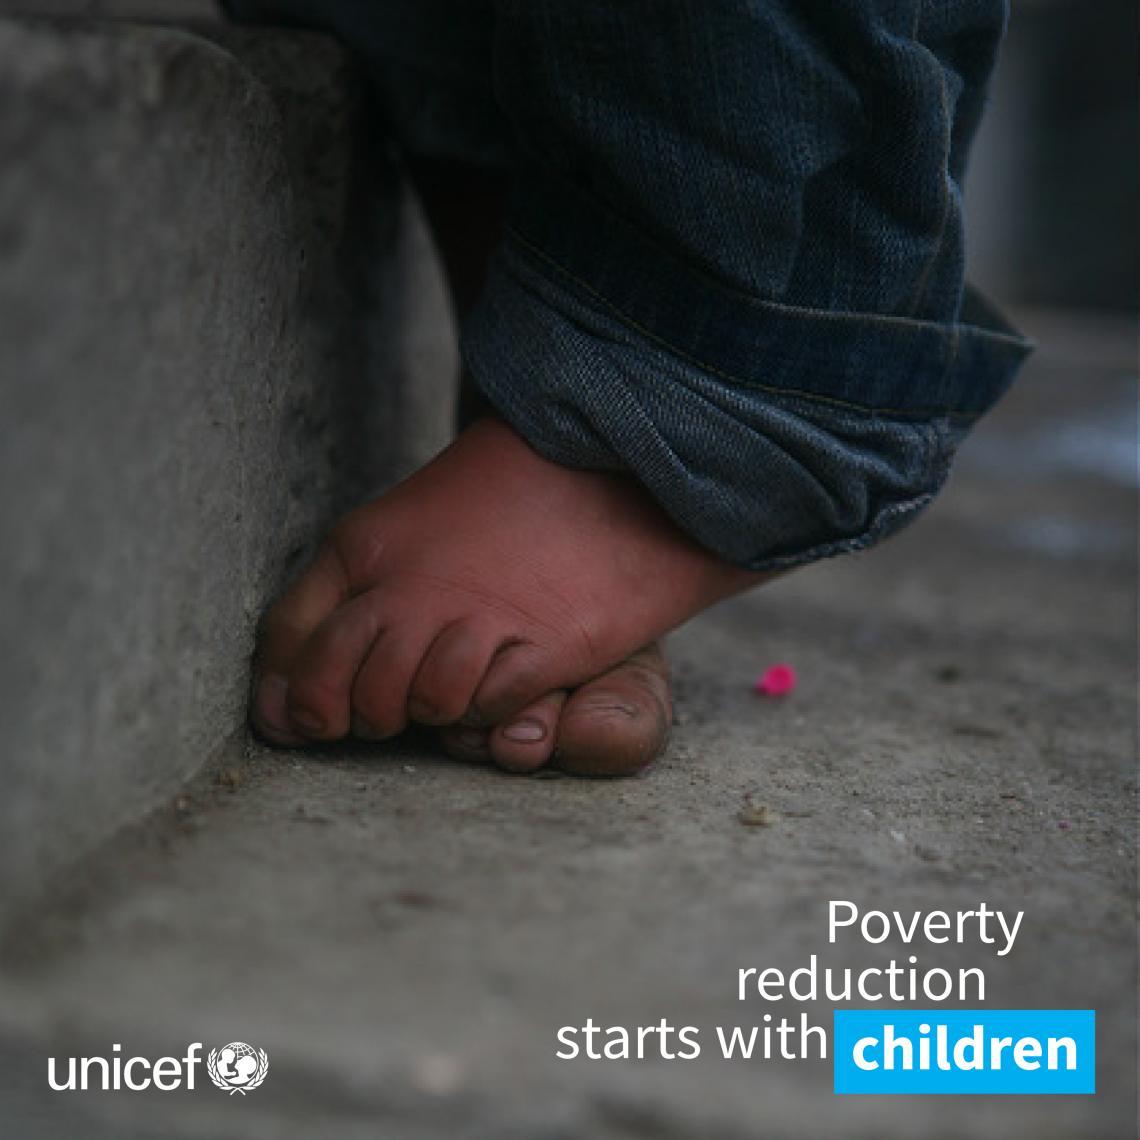 UNICEF: no cuts in public spending for children